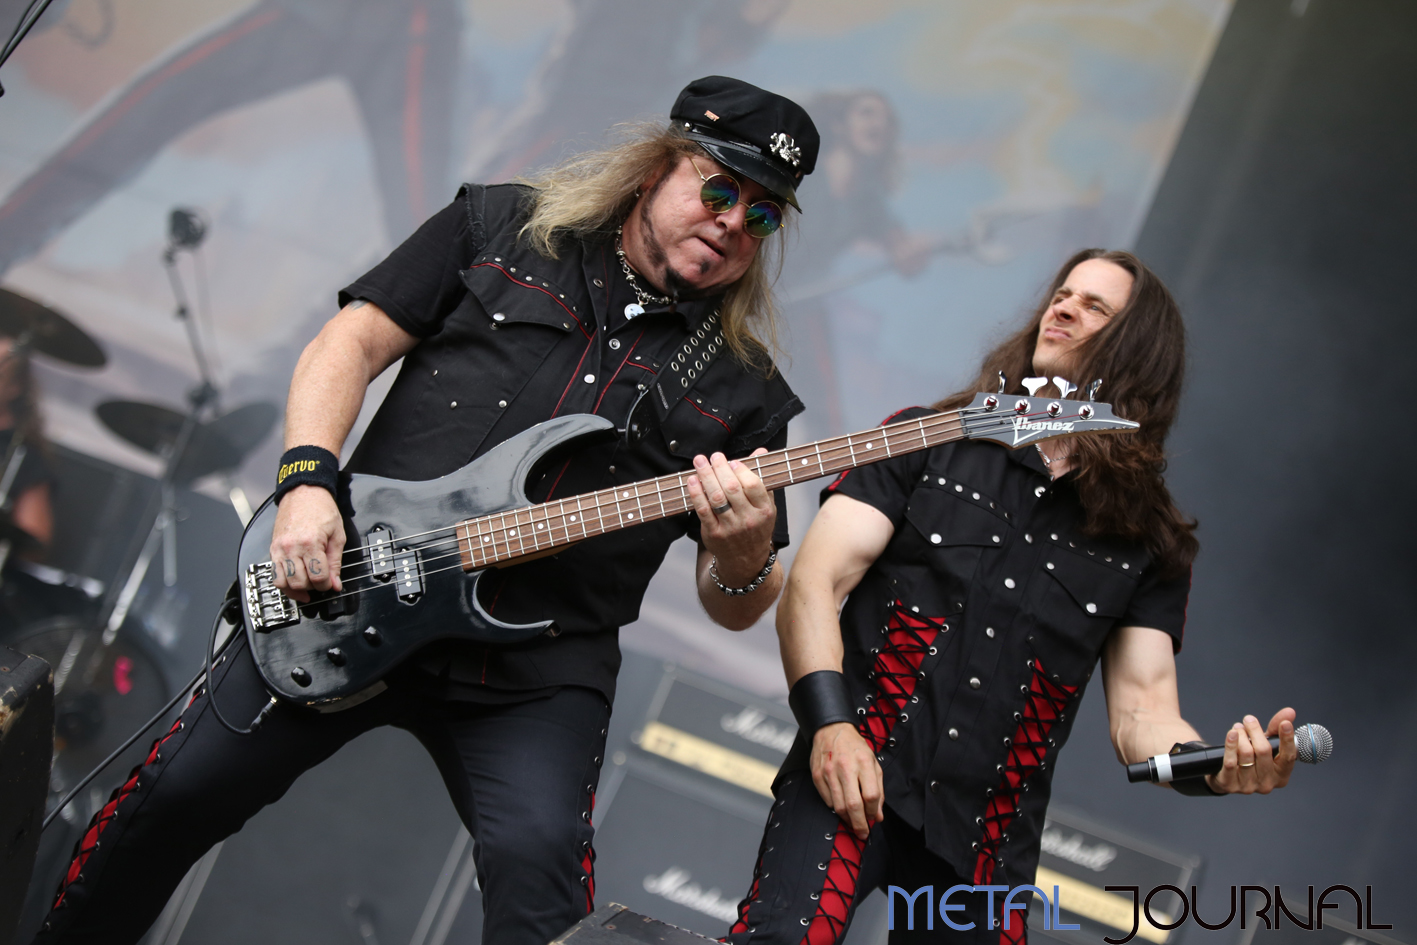 riot v - leyendas del rock 2018 pic 10